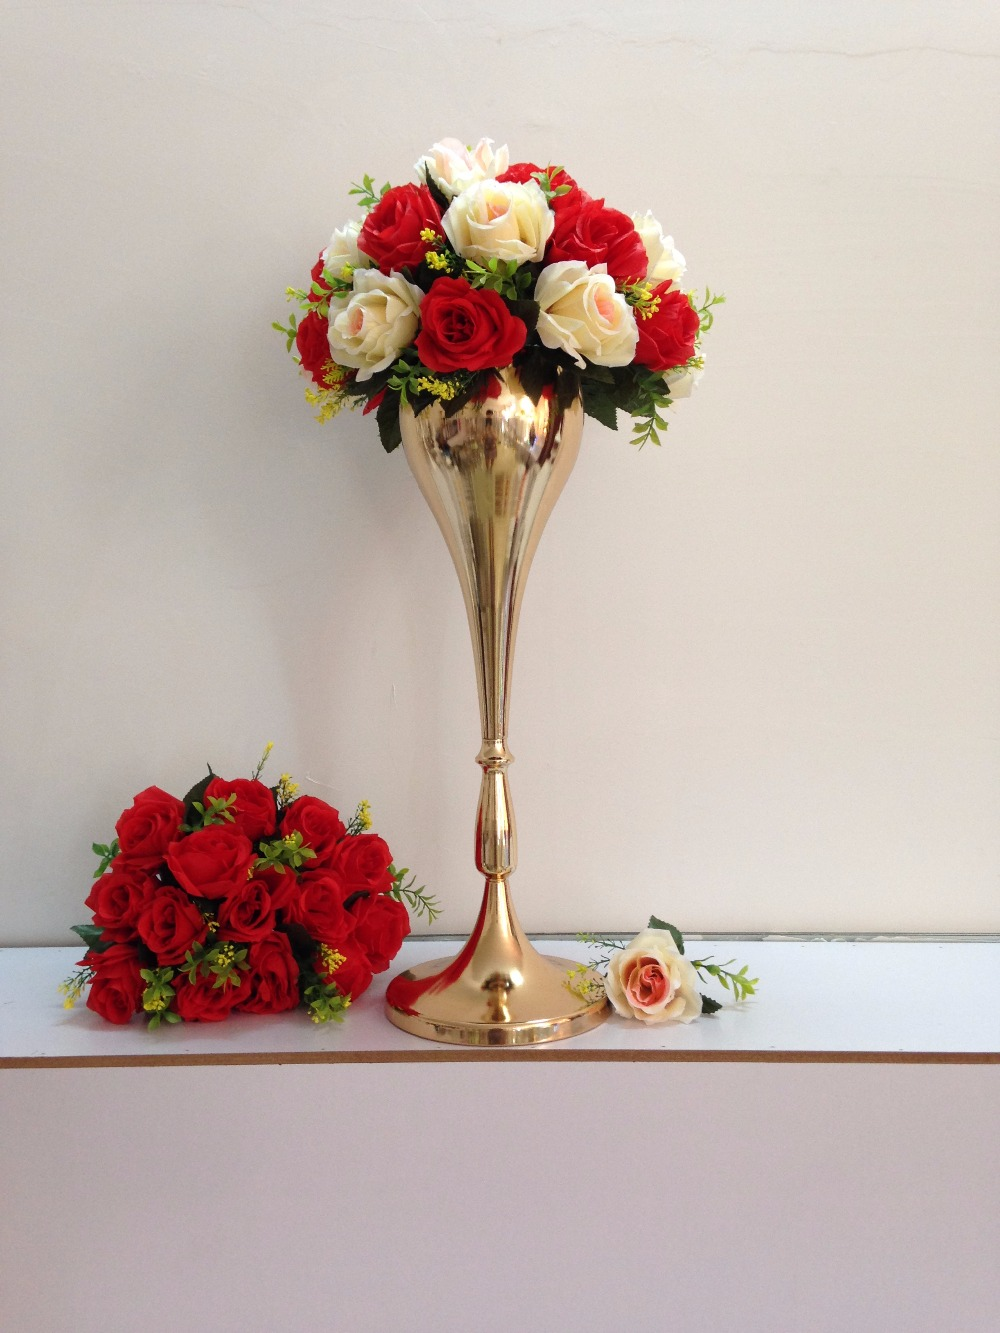 Luxury wedding table standflower vasewedding propsparty table luxury wedding table standflower vasewedding propsparty table centerpiece height of 56cm in vases from home garden on aliexpress alibaba group izmirmasajfo Images